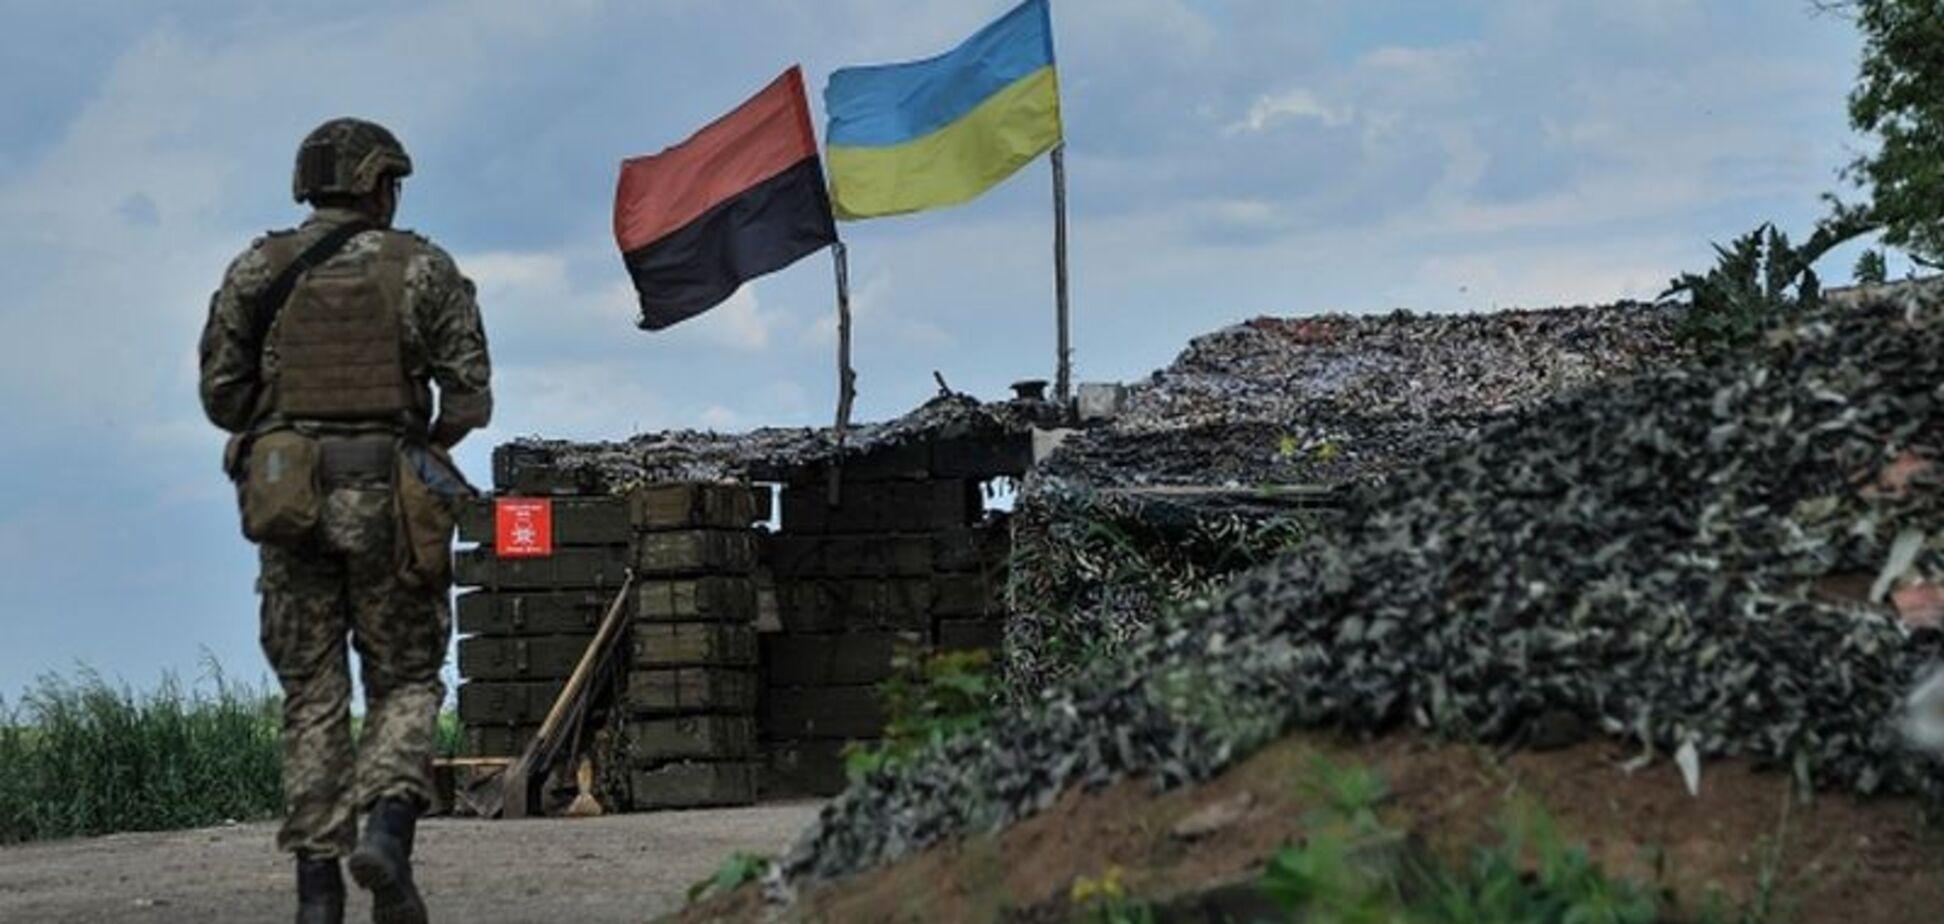 Реінтеграція Донбасу: Росія поскаржилася на Україну в ЄС